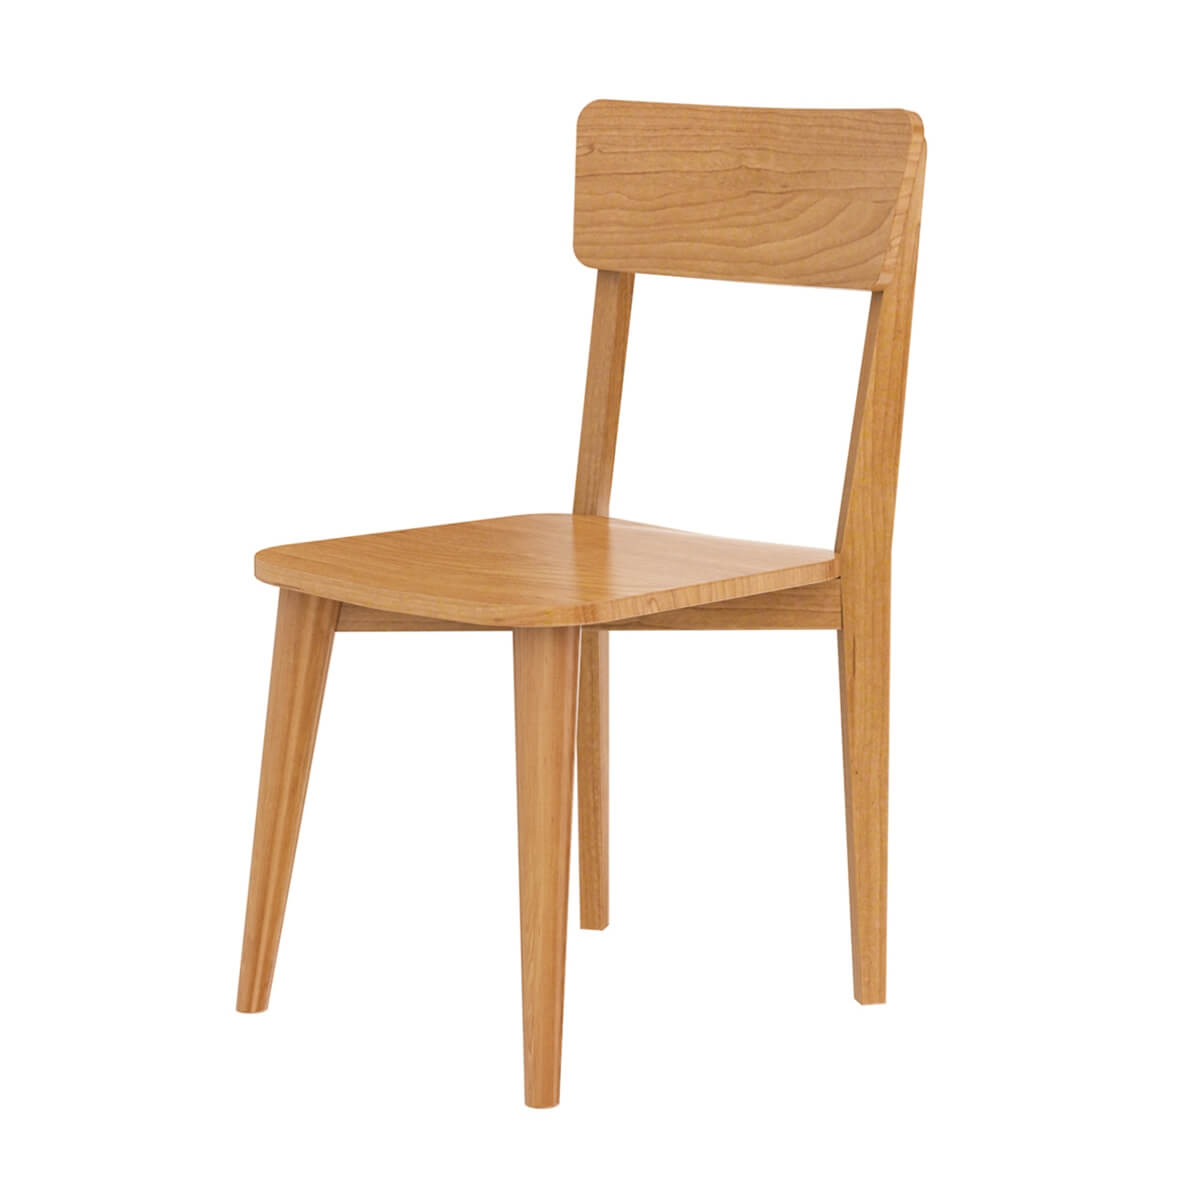 Avondale Teak Wood Modern Style Dining Chair